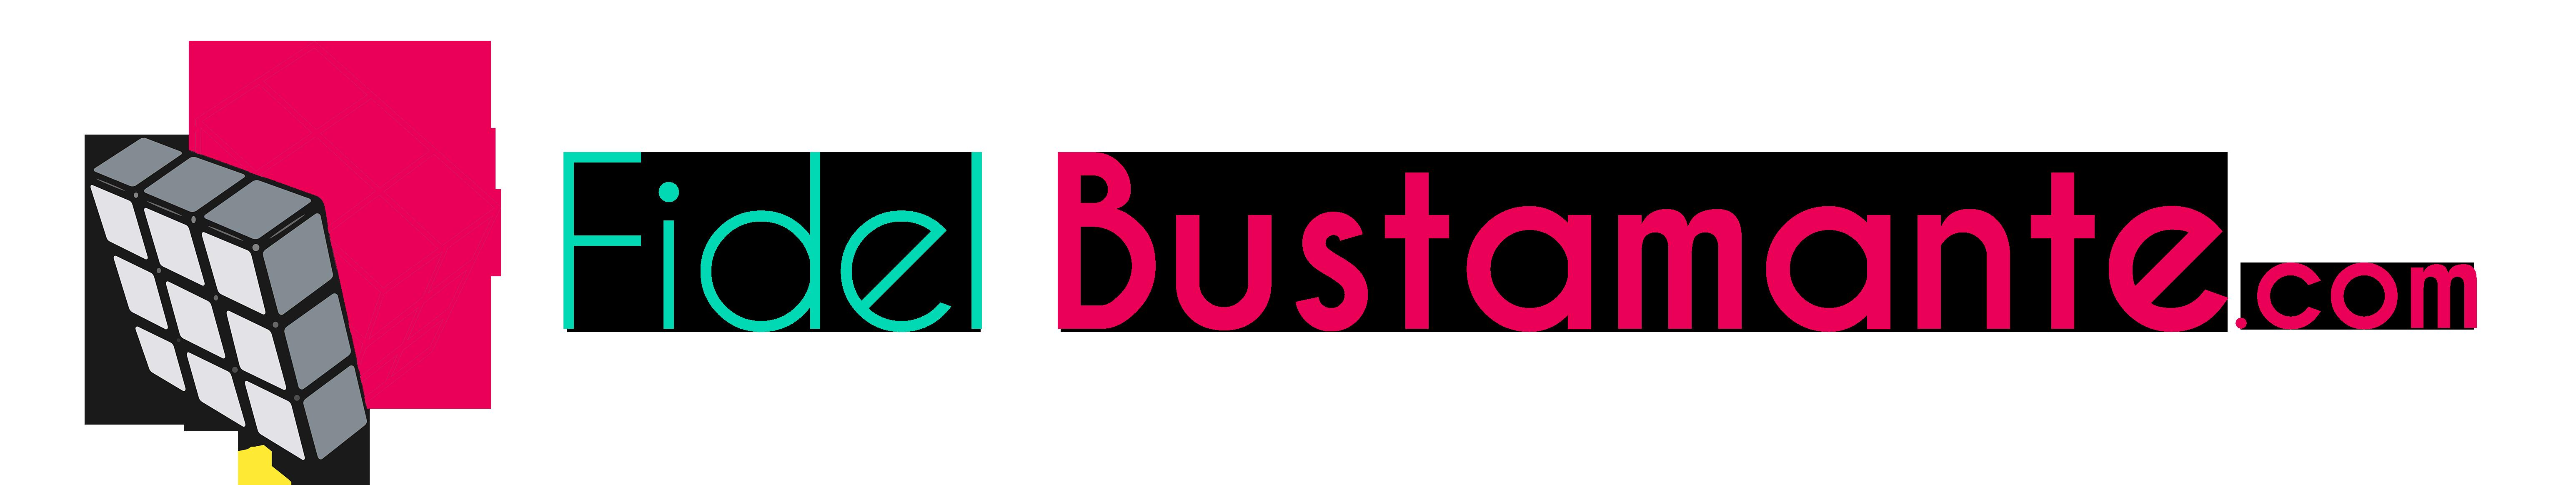 logo fidel bustamante horizontal 2020